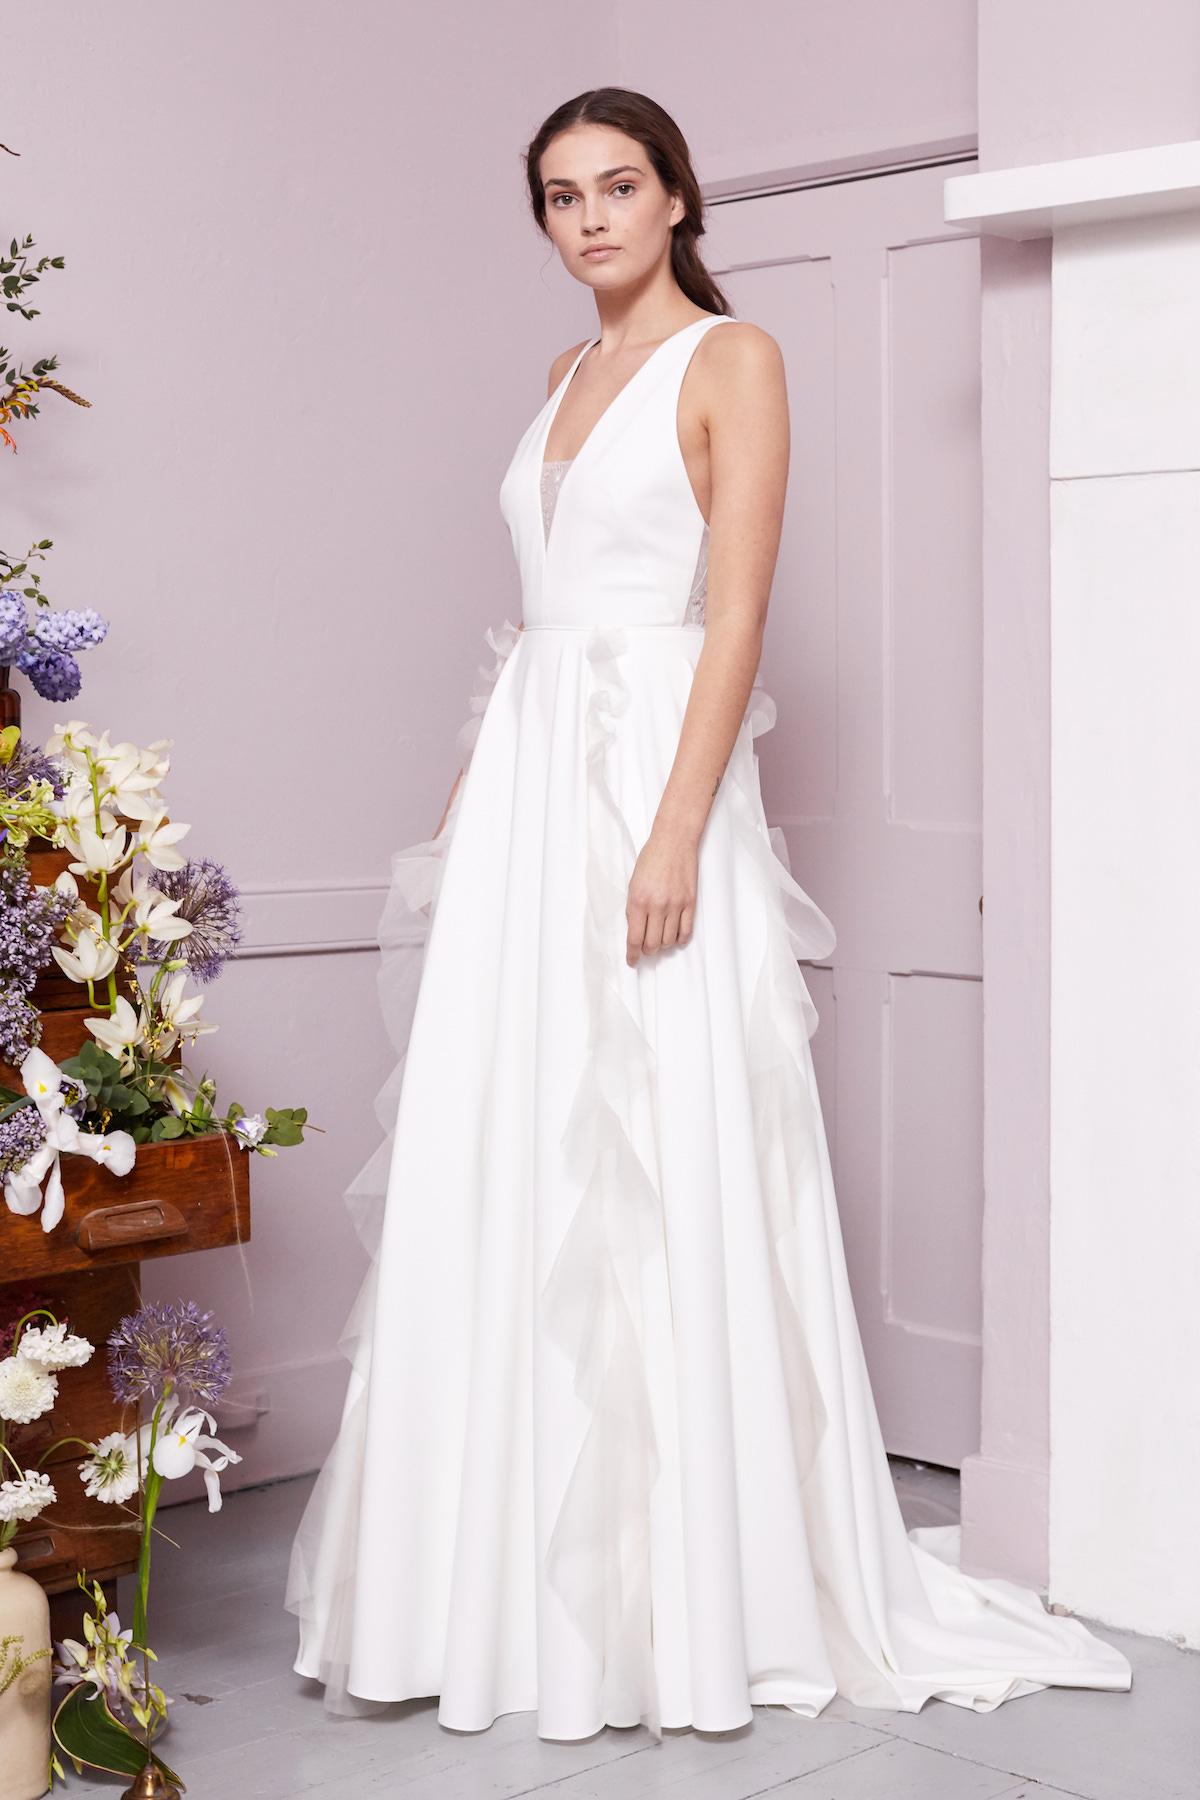 Klimt gown | Wedding dress by Halfpenny London